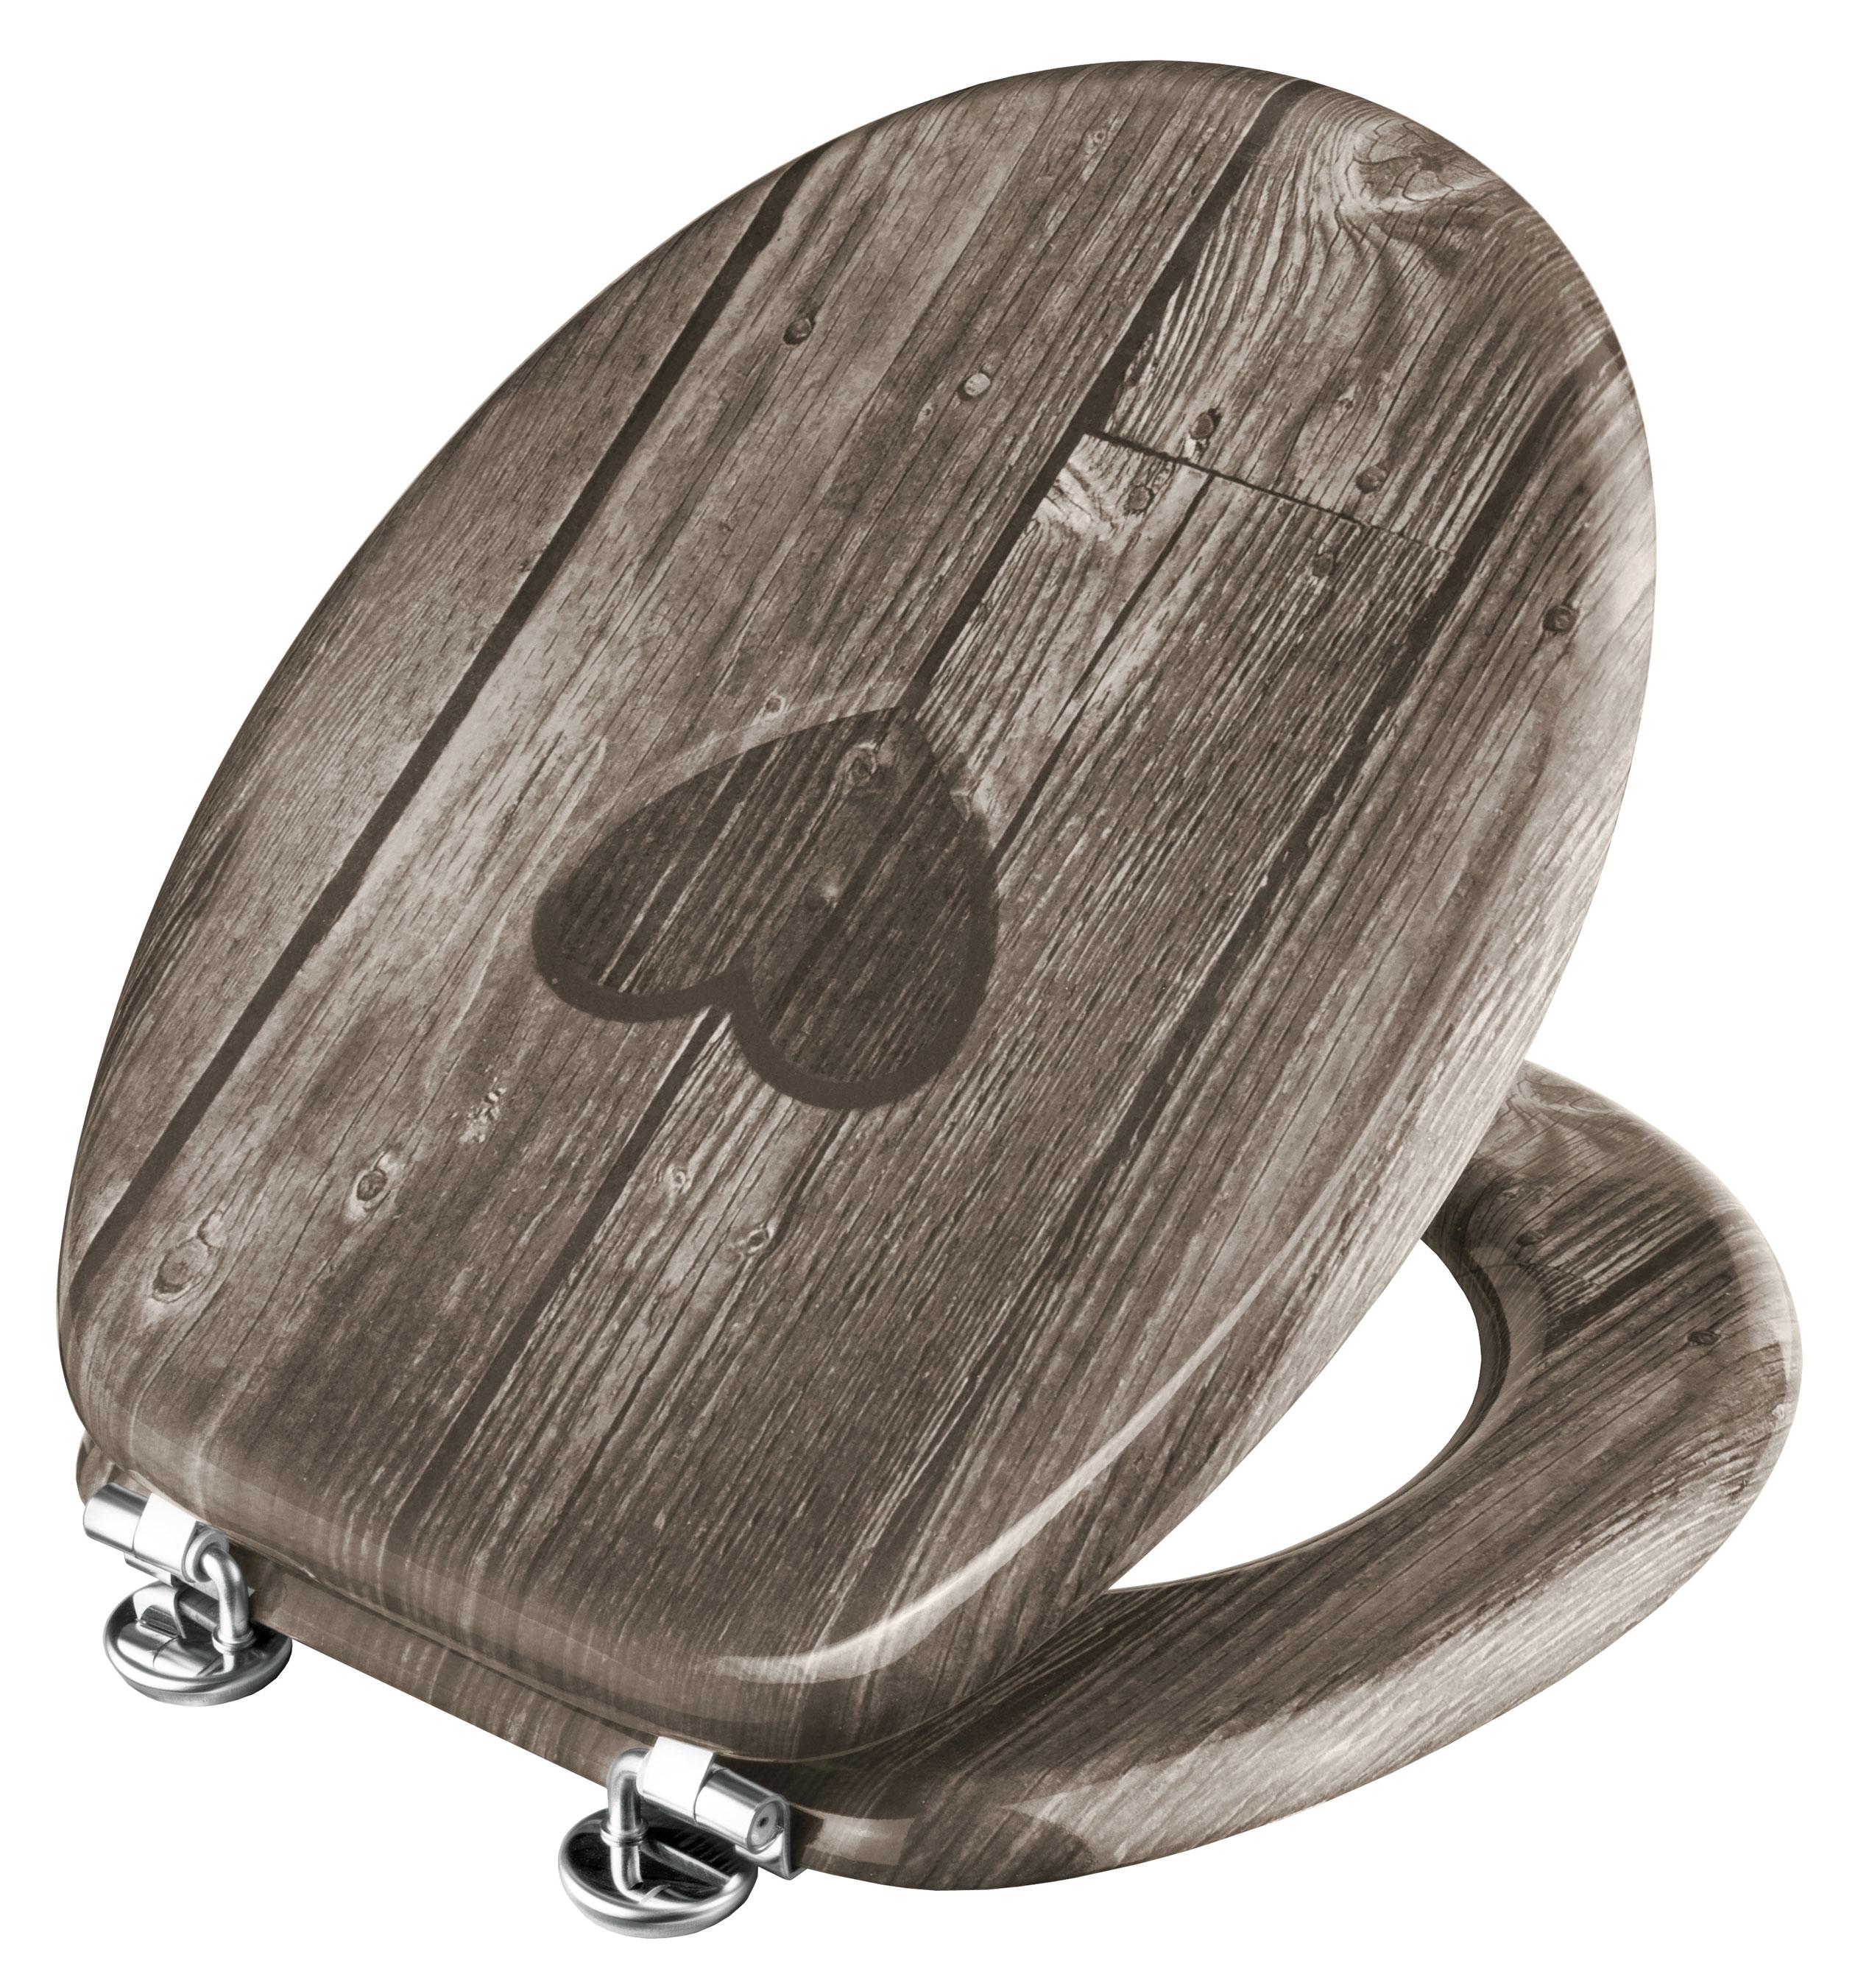 Cornat WC-Sitz / Toilettendeckel Dekor Herz Bild 1